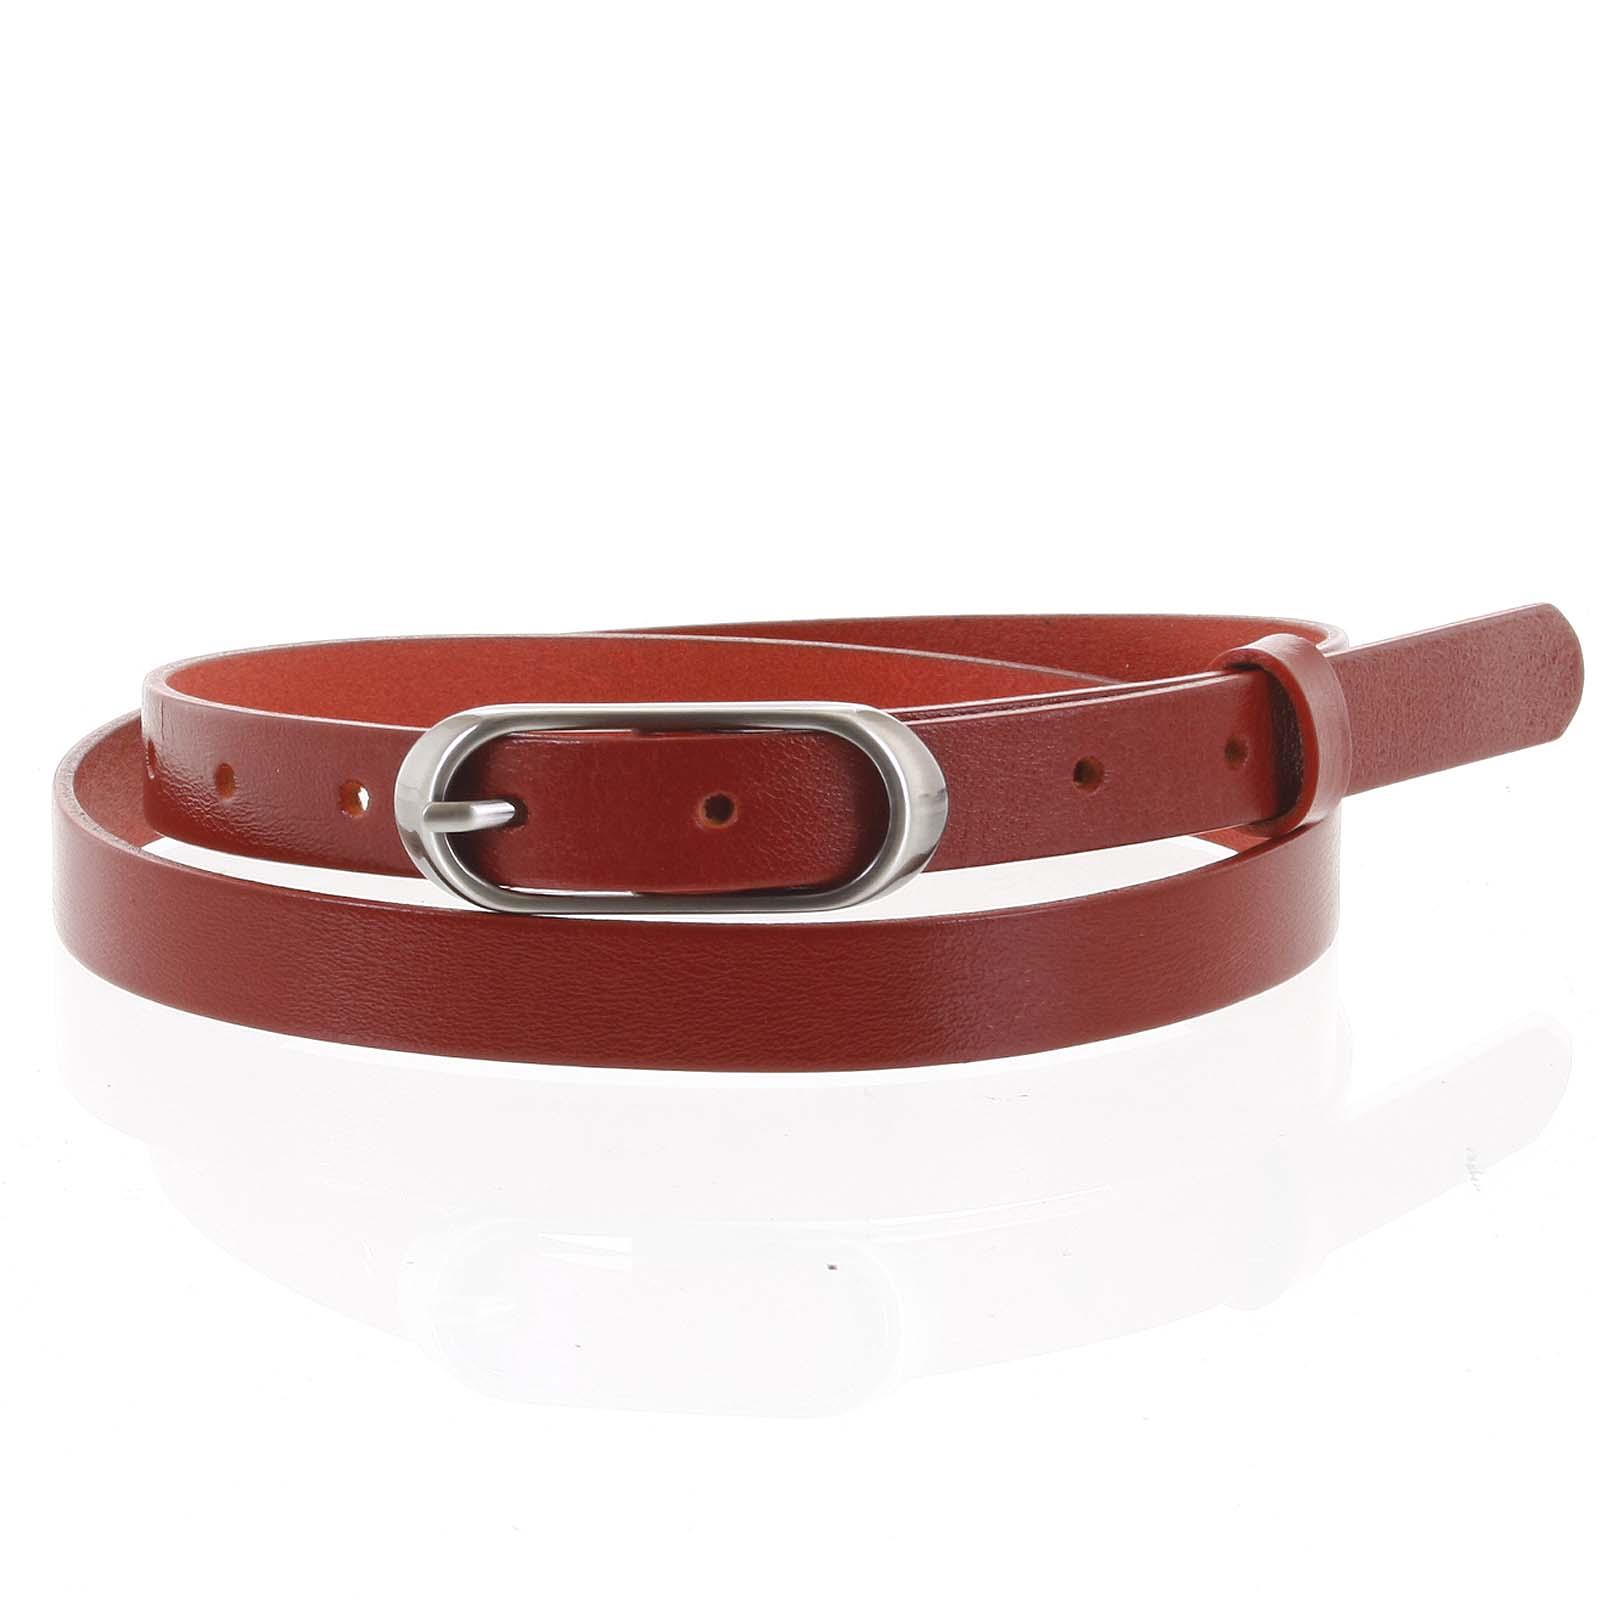 Dámský kožený opasek červený - PB Cain 100